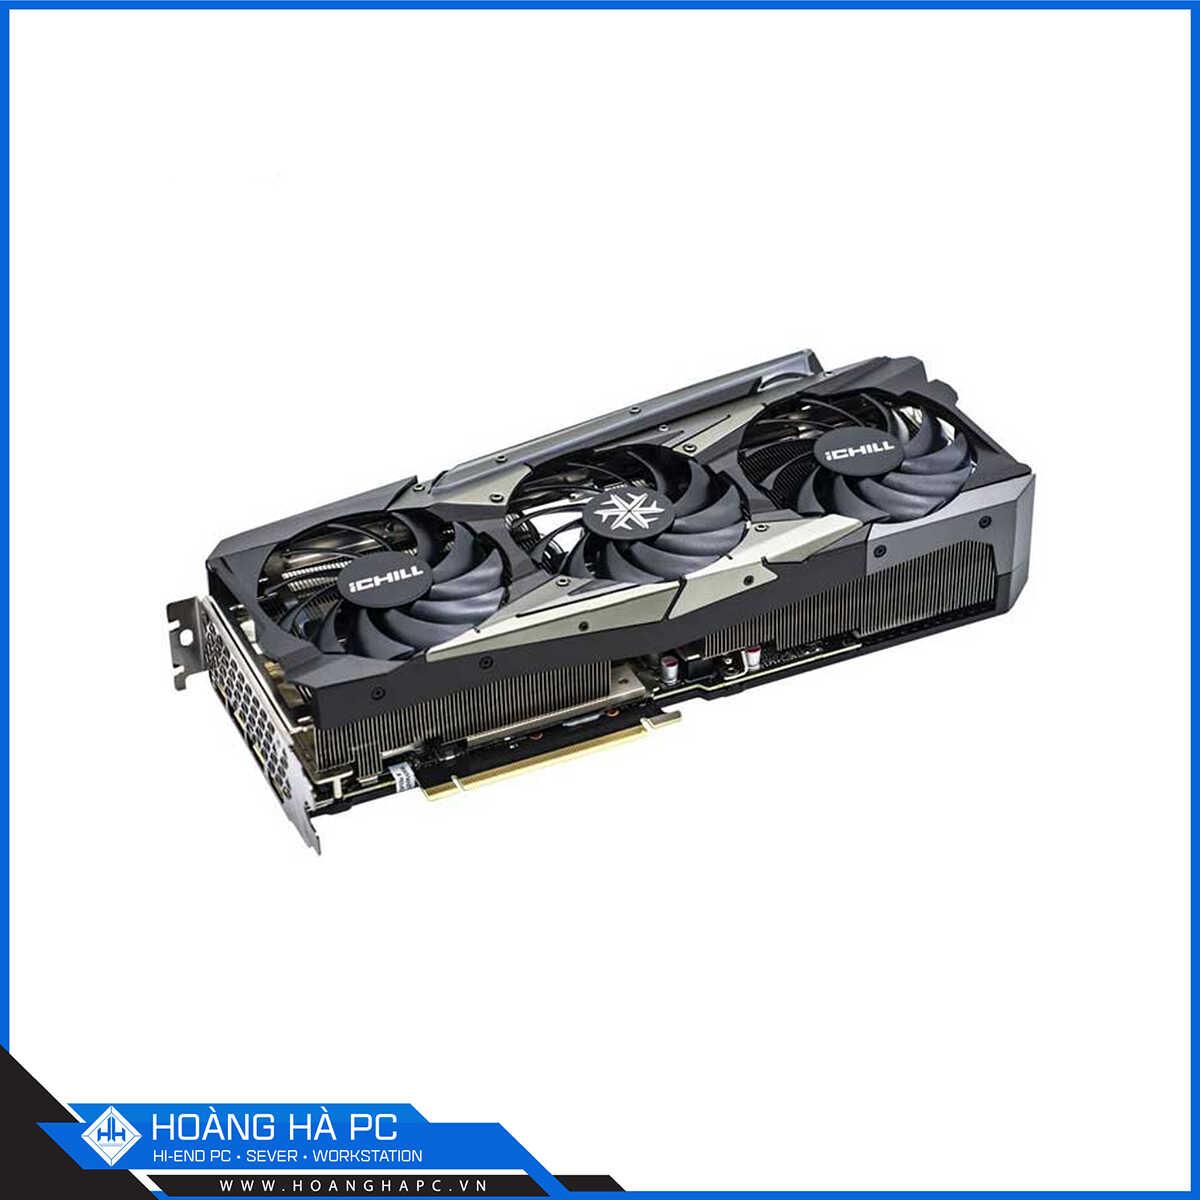 INNO3D RTX 3070 8GB iCHILL X4